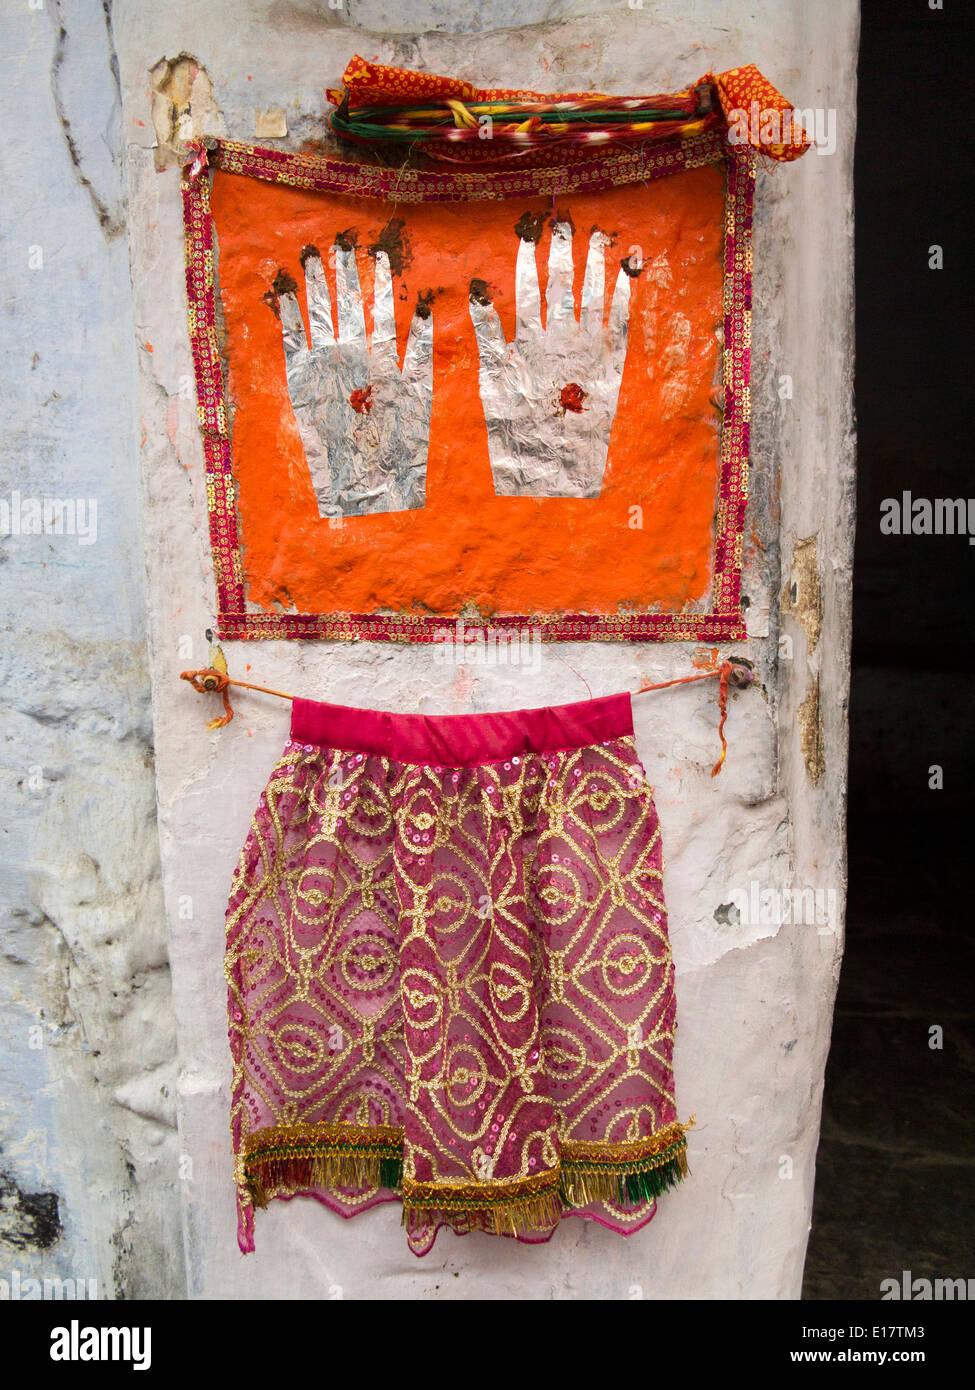 India Rajasthan Udaipur Hamsa Hand Symbols At House Doorway For